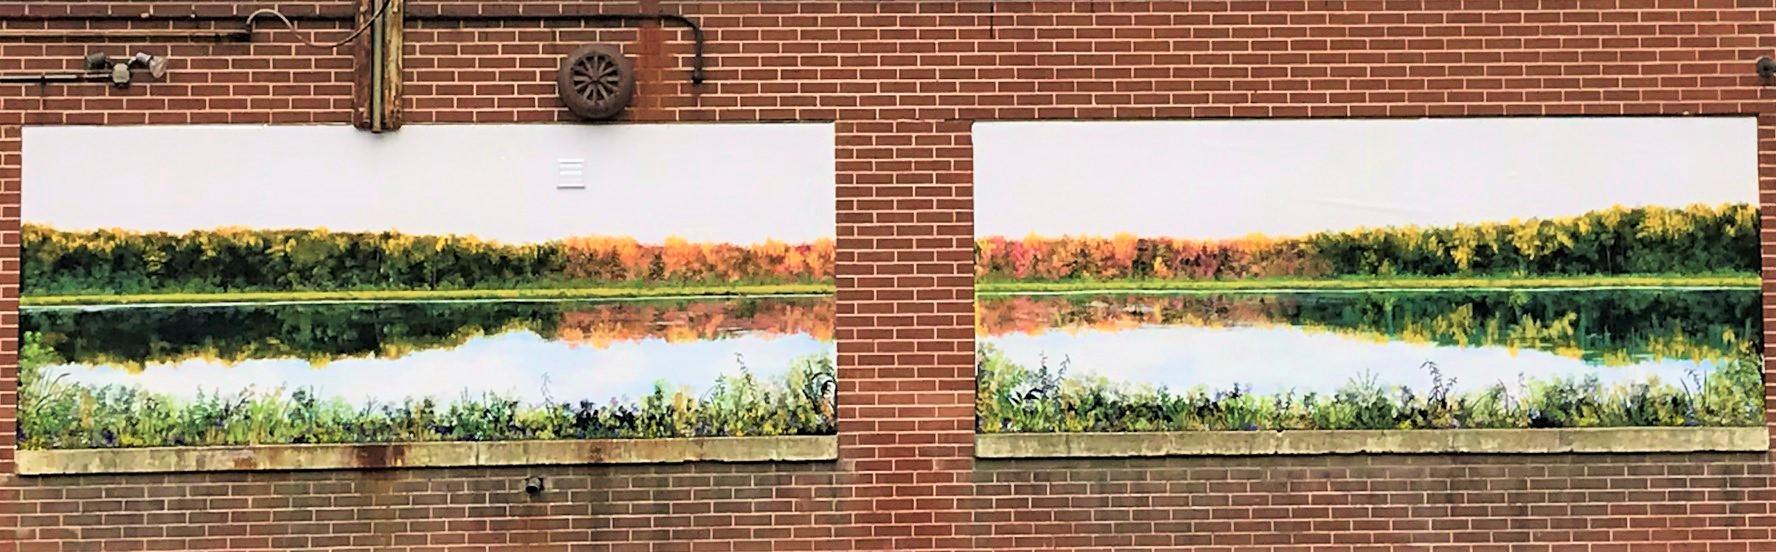 mural on studio exterior